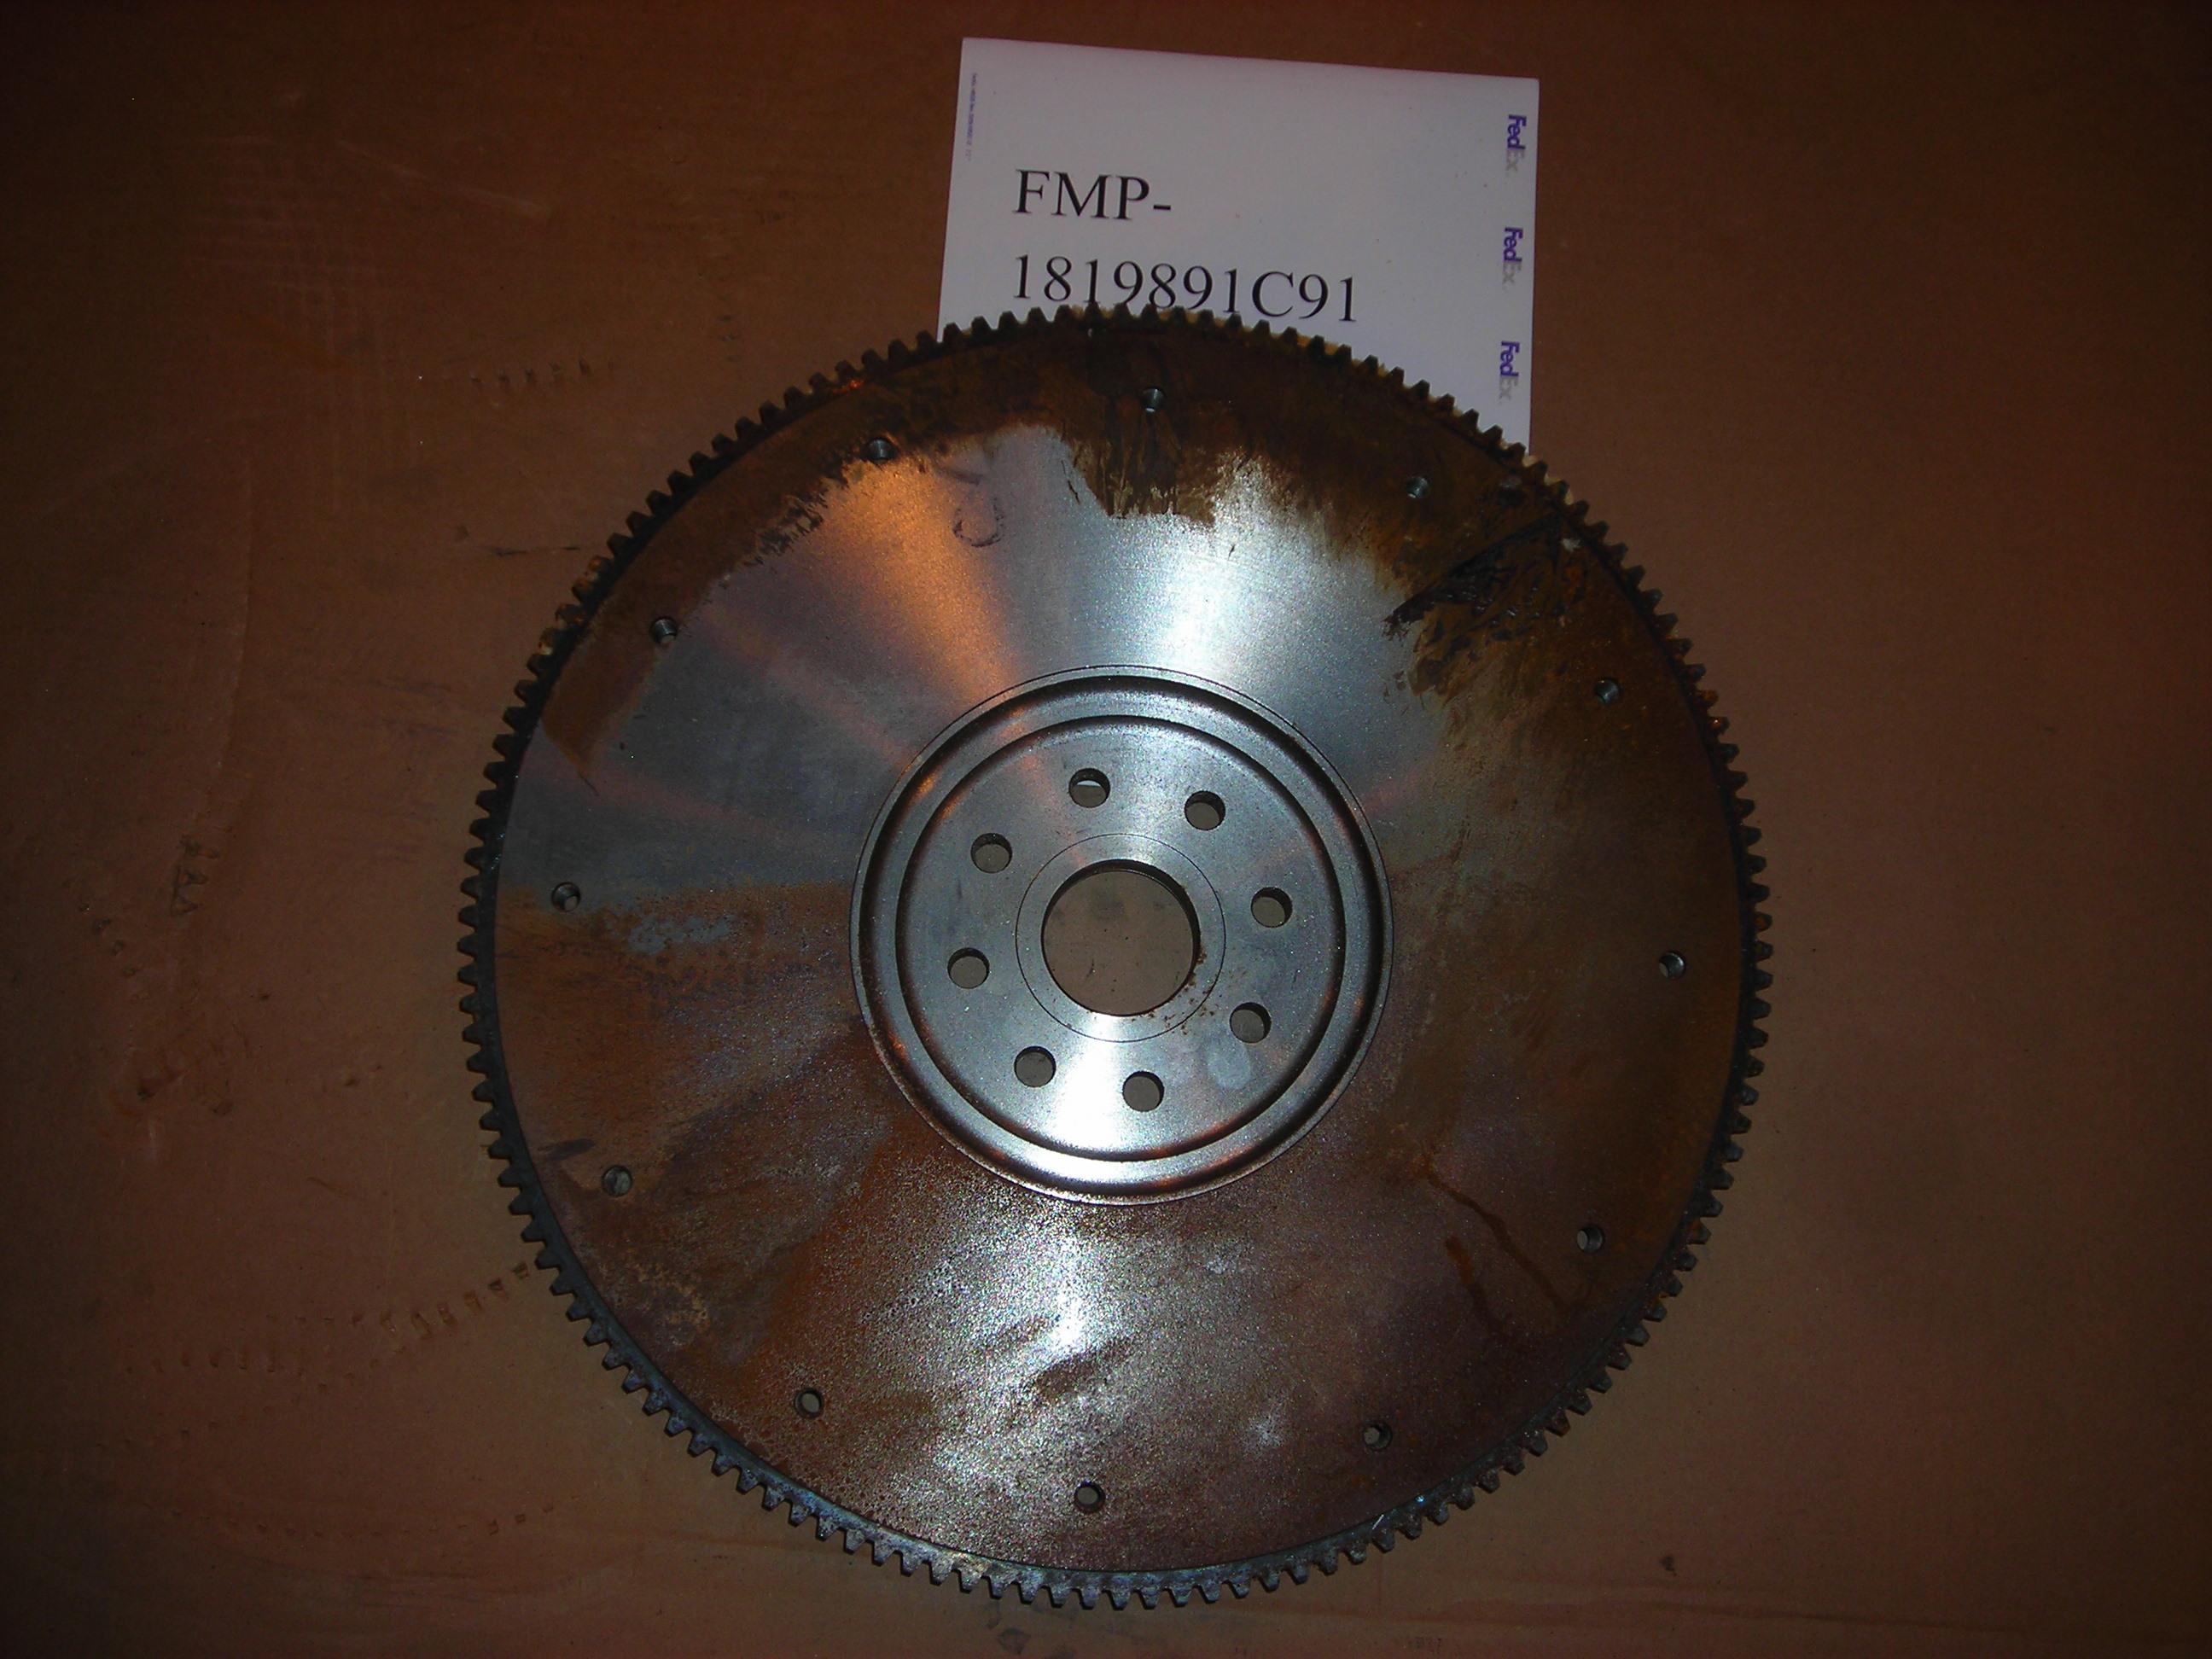 1819891C91 Navistar International Flywheel Front